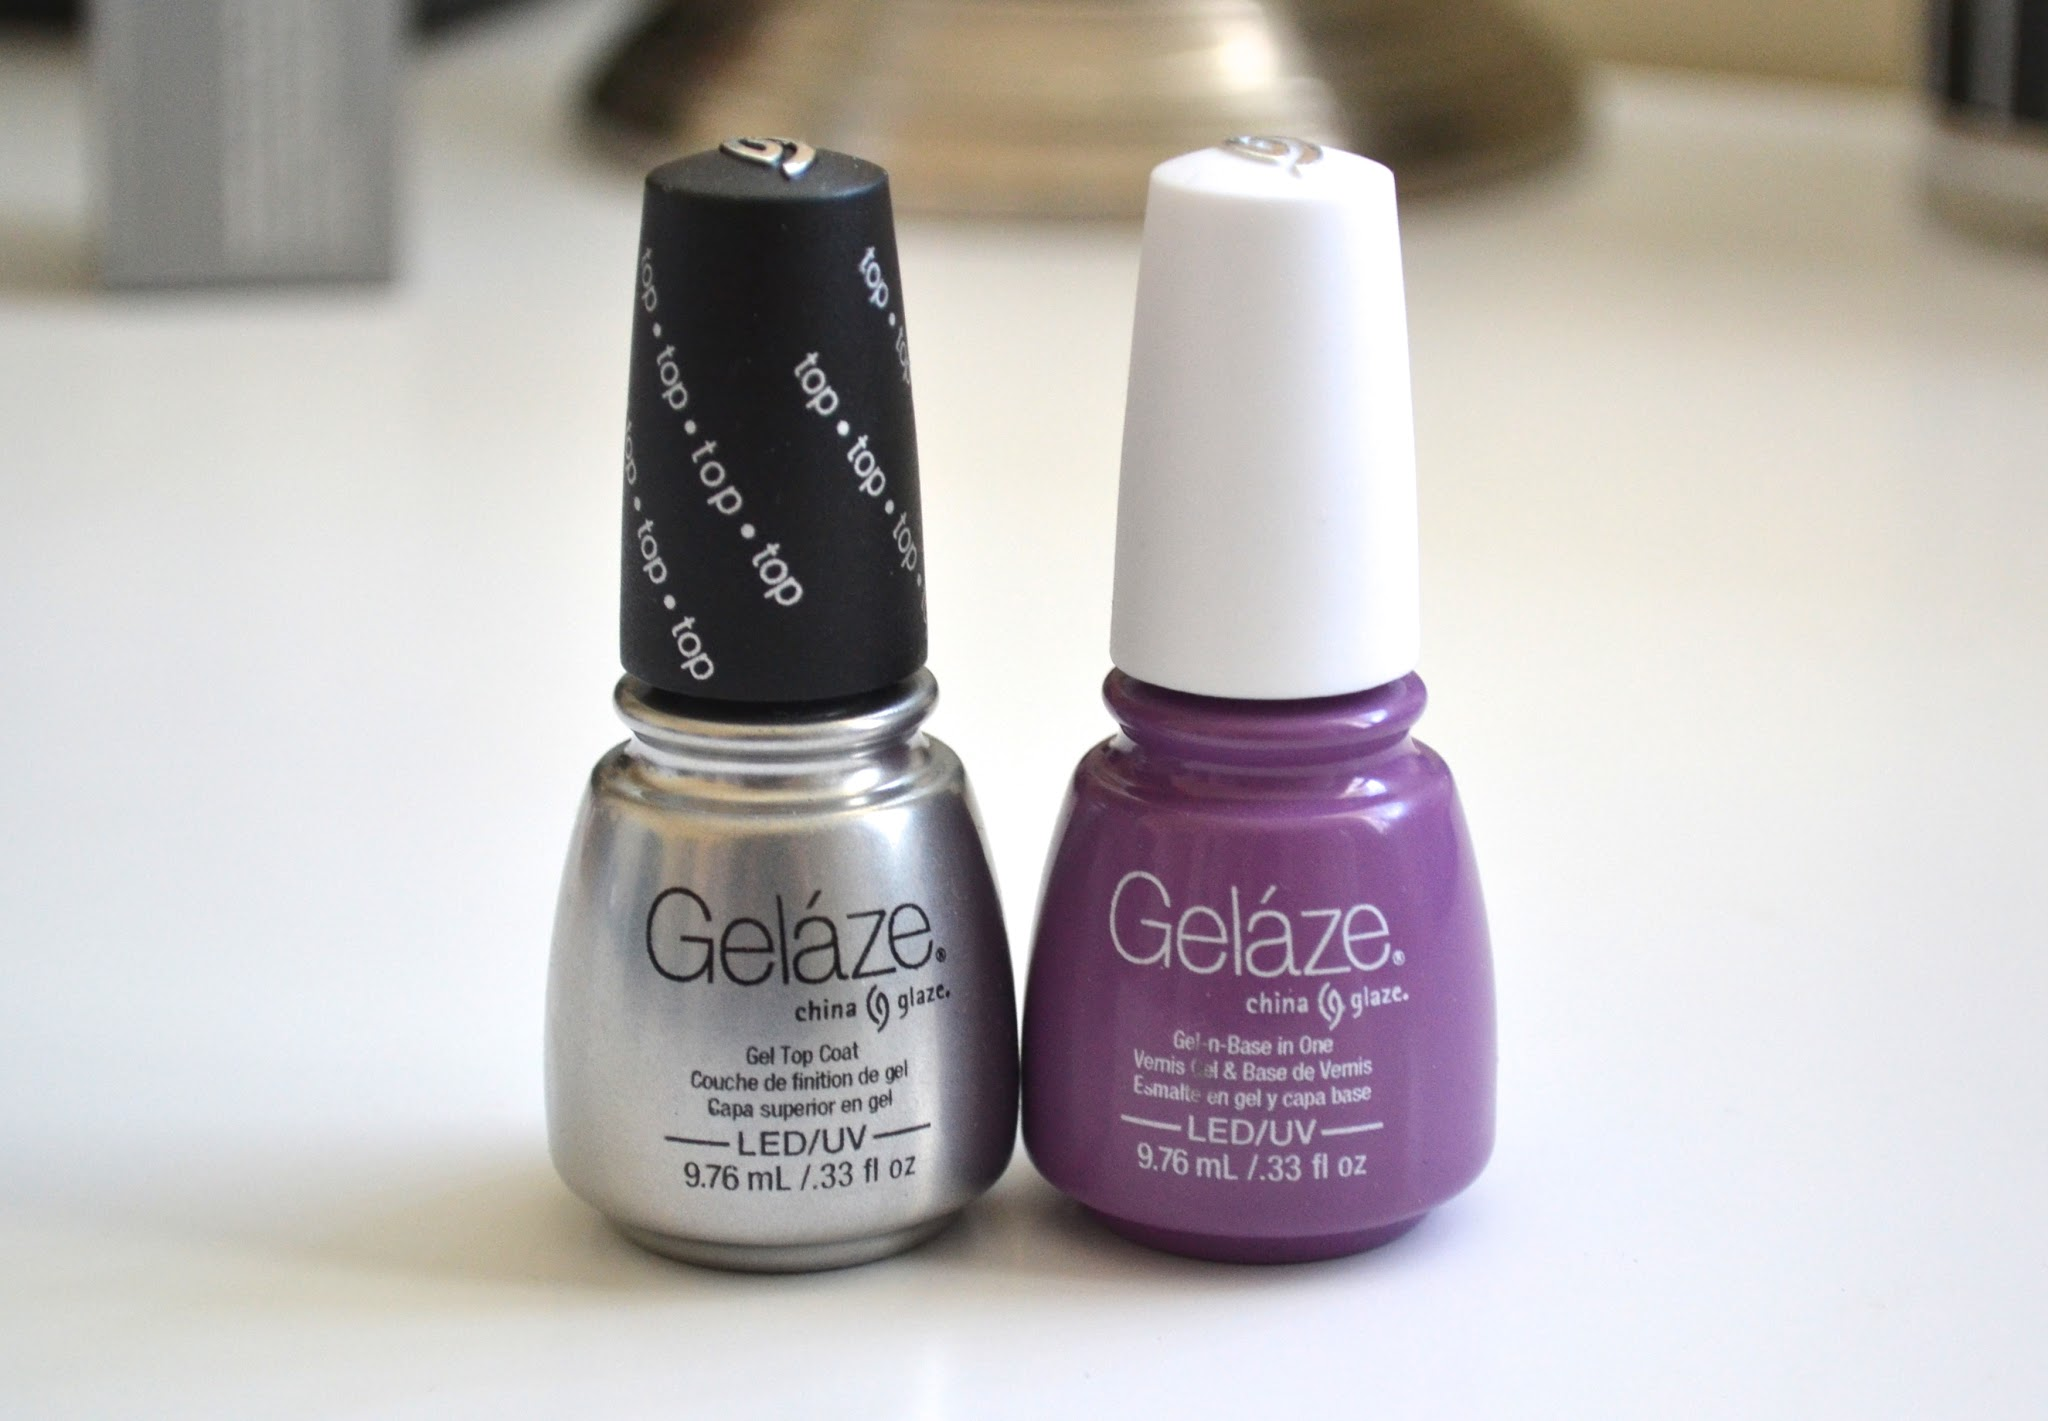 China Glaze Gel Nail Polish Review - Creative Touch